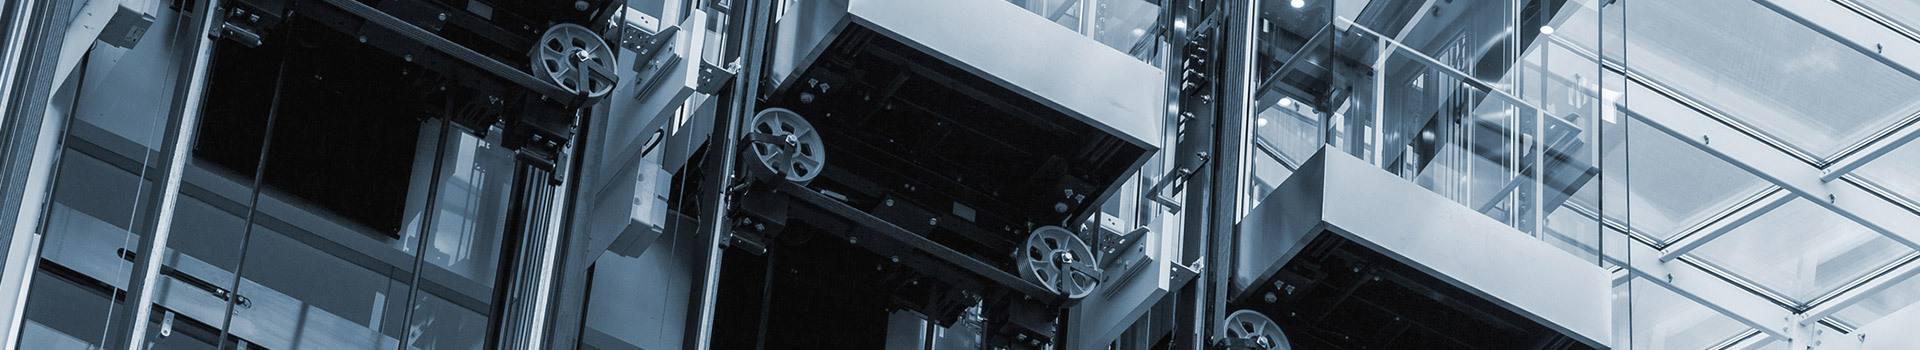 Lift Service Midlands, Lift Breakdown Midlands, Lift Repairs Midlands